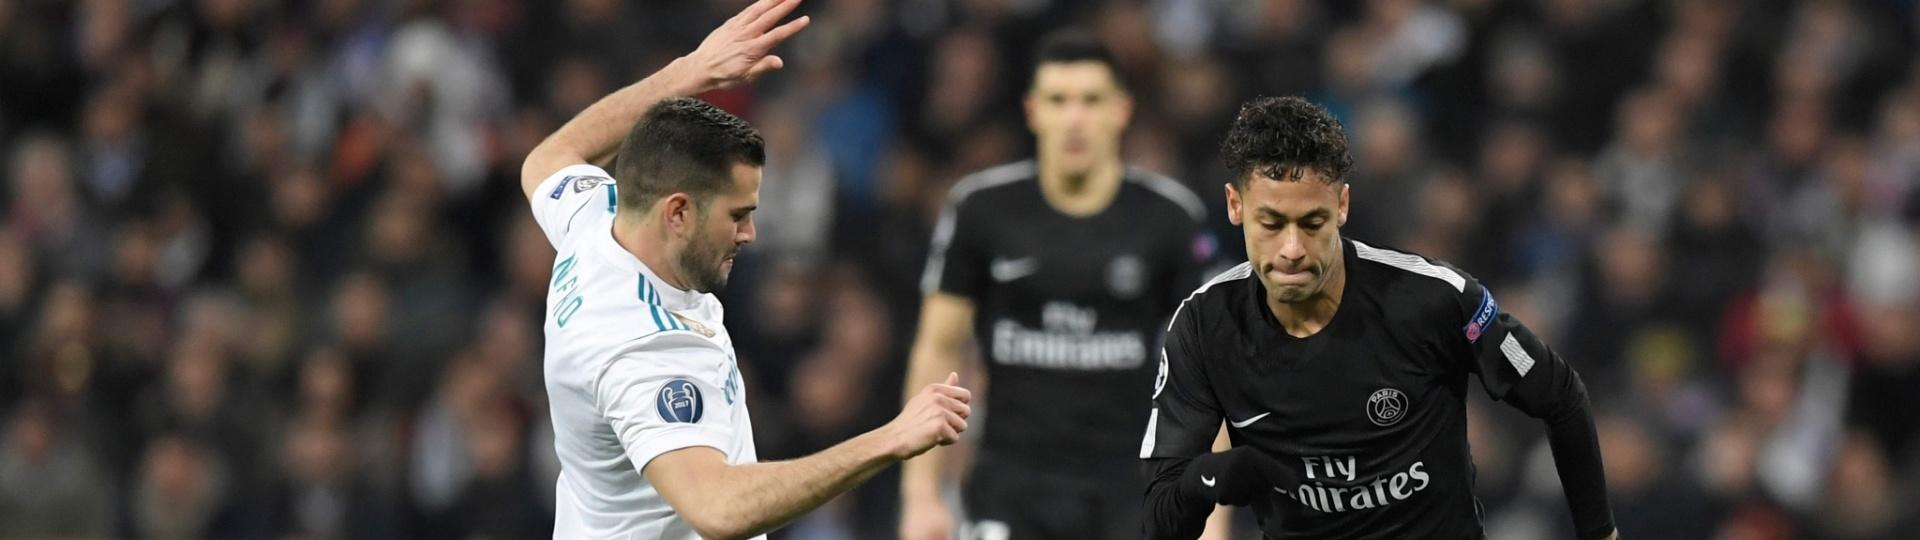 Neymar dribla Nacho na partida entre Real Madrid e PSG